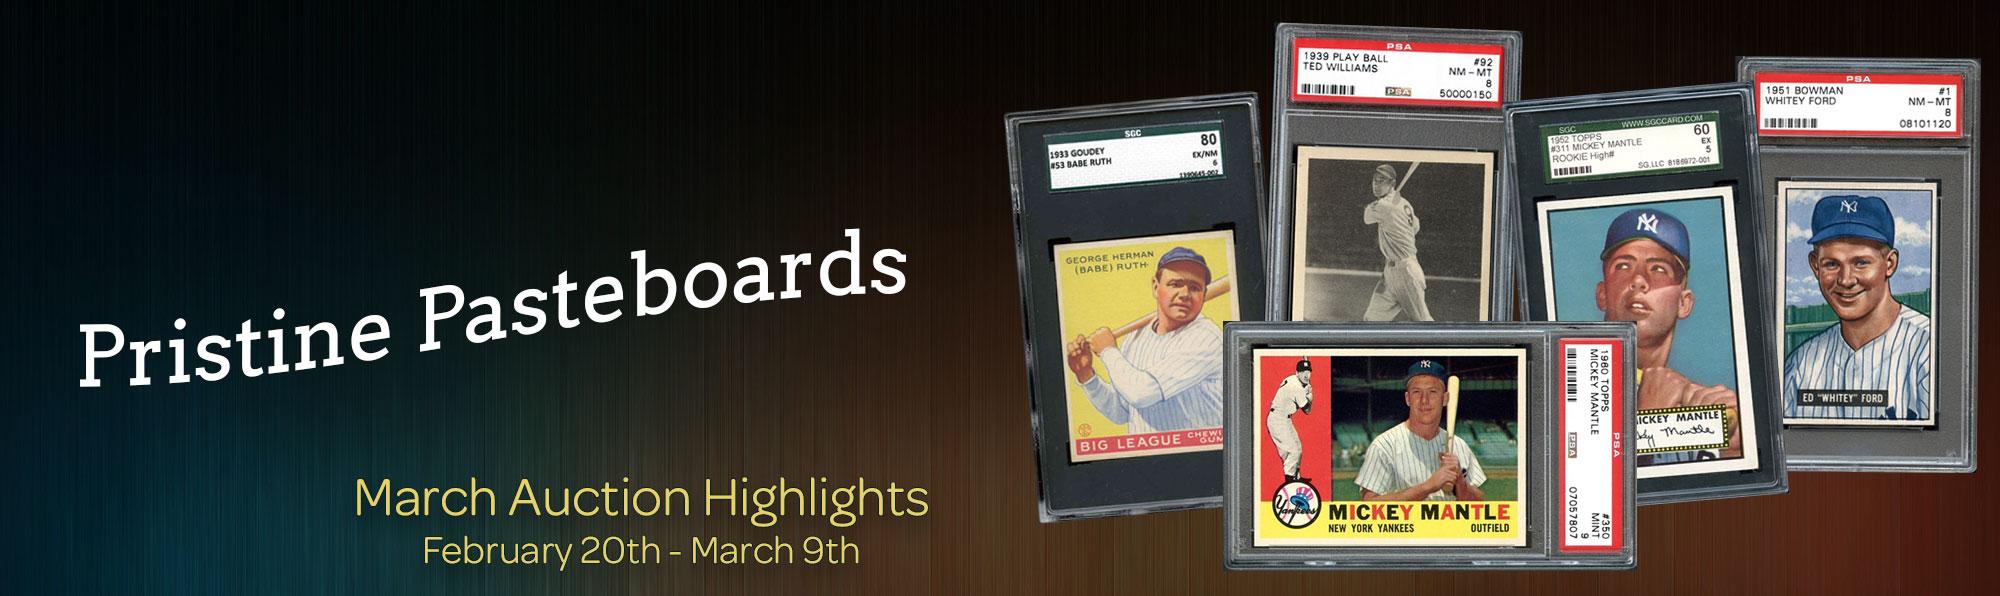 March Catalog runs February 20th - March 9th